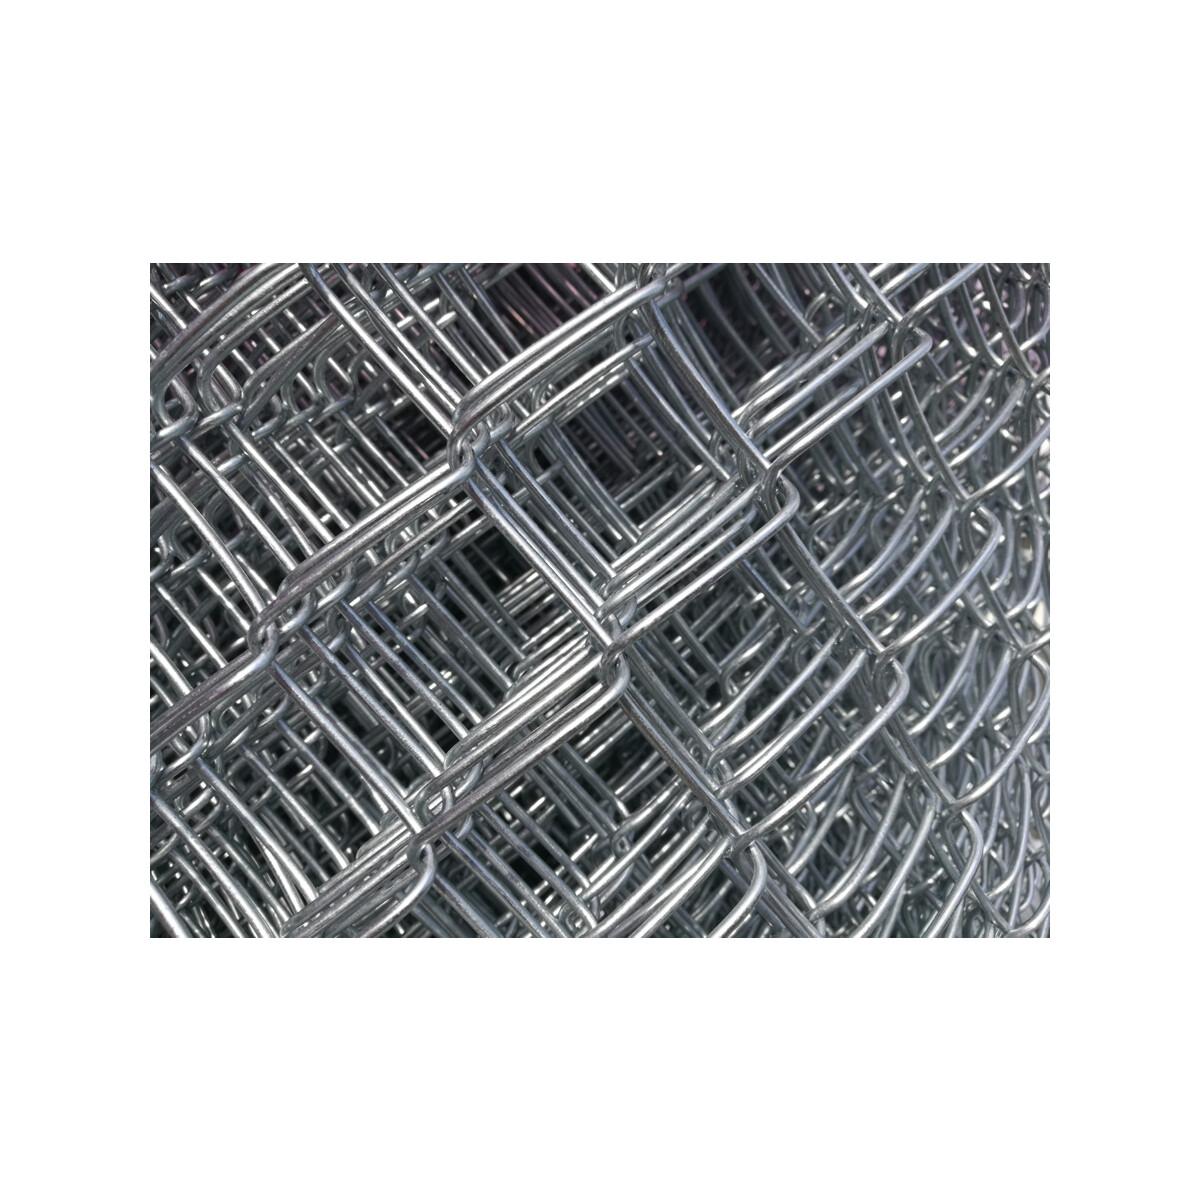 Diagonalgeflecht MW 50 x 50 mm, Draht 2.5 mm - ### REAL ZÄUNE AG ###